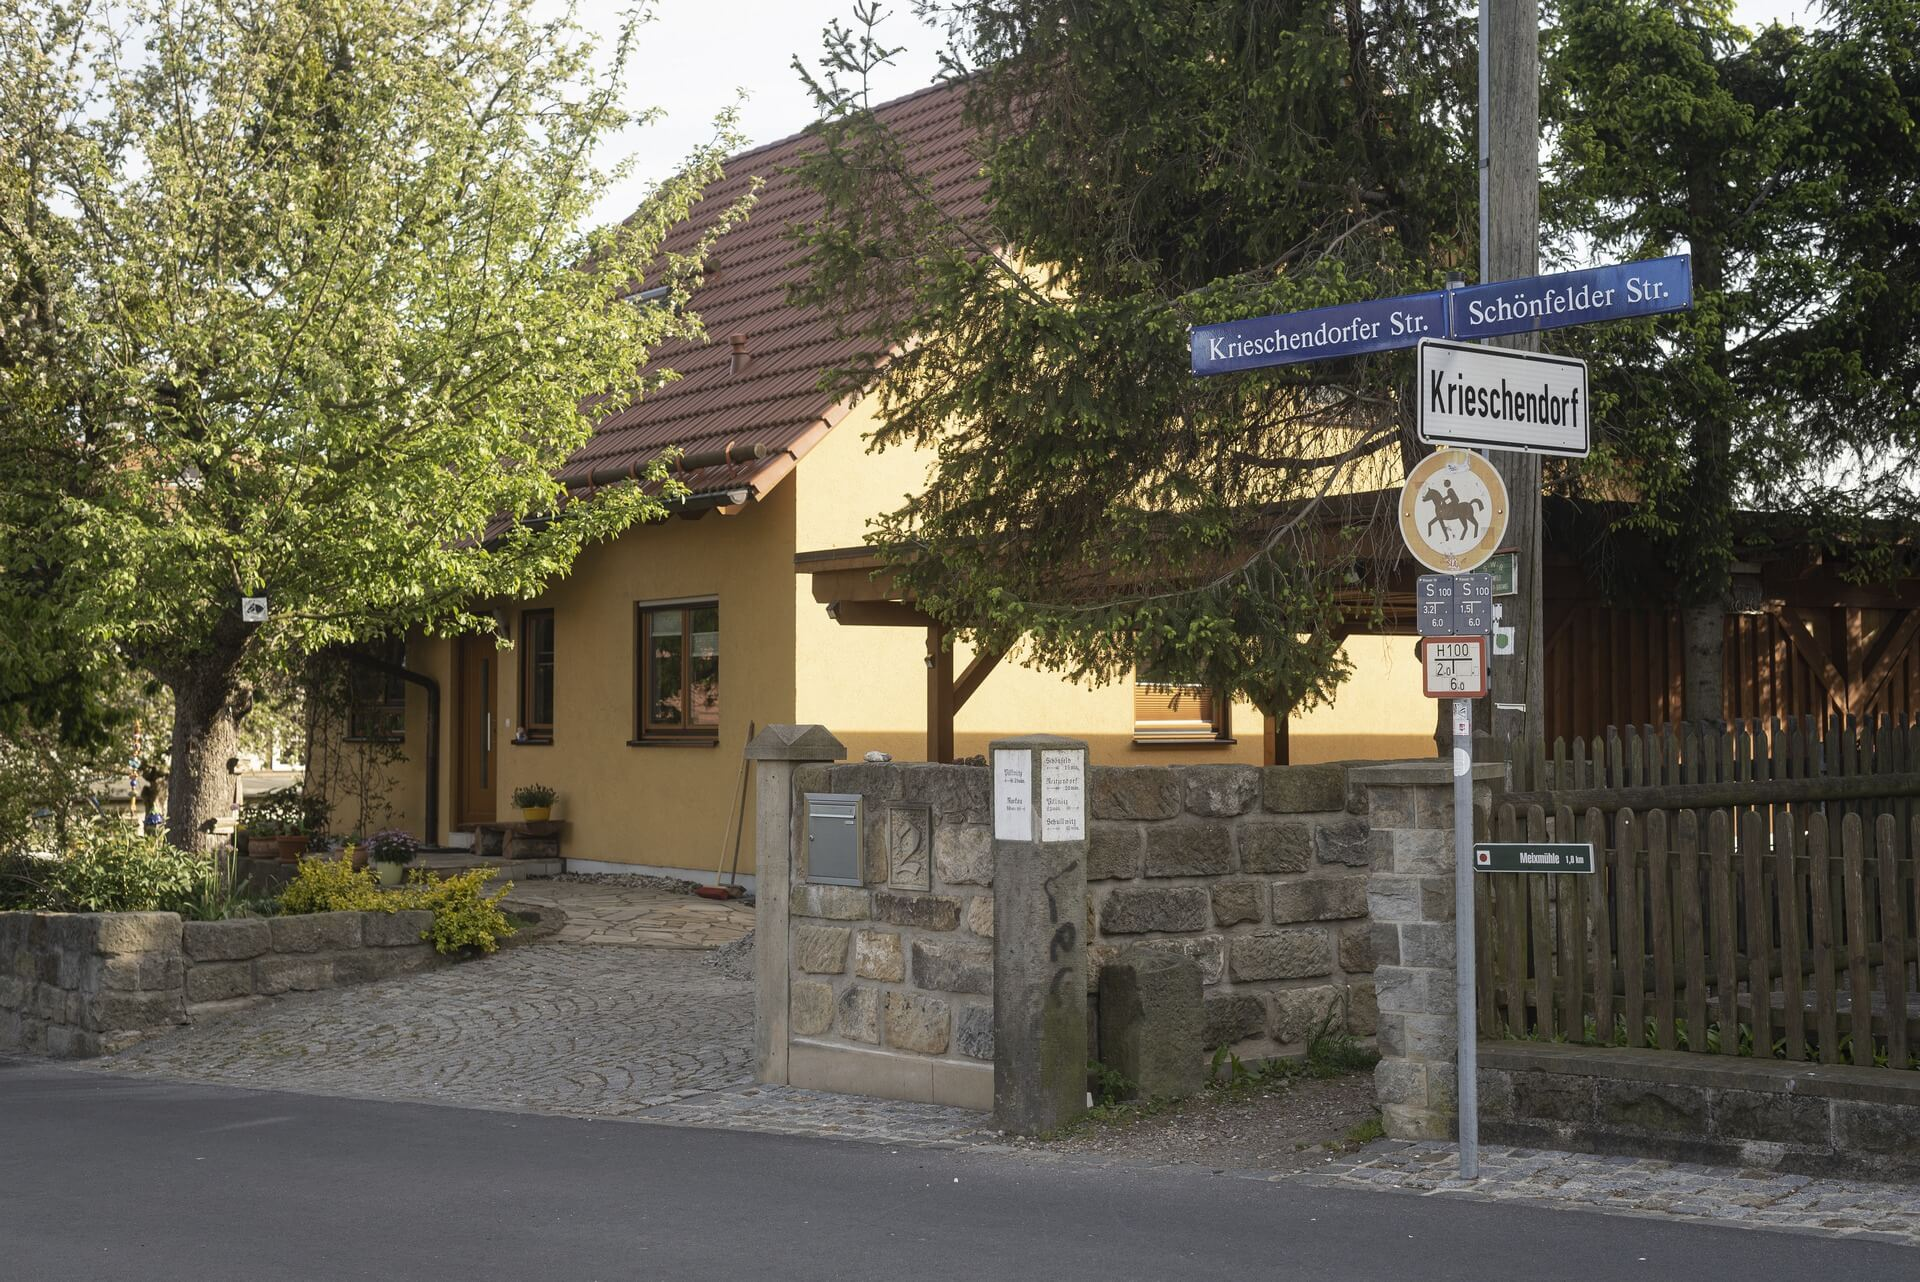 Dresden - Krieschendorf